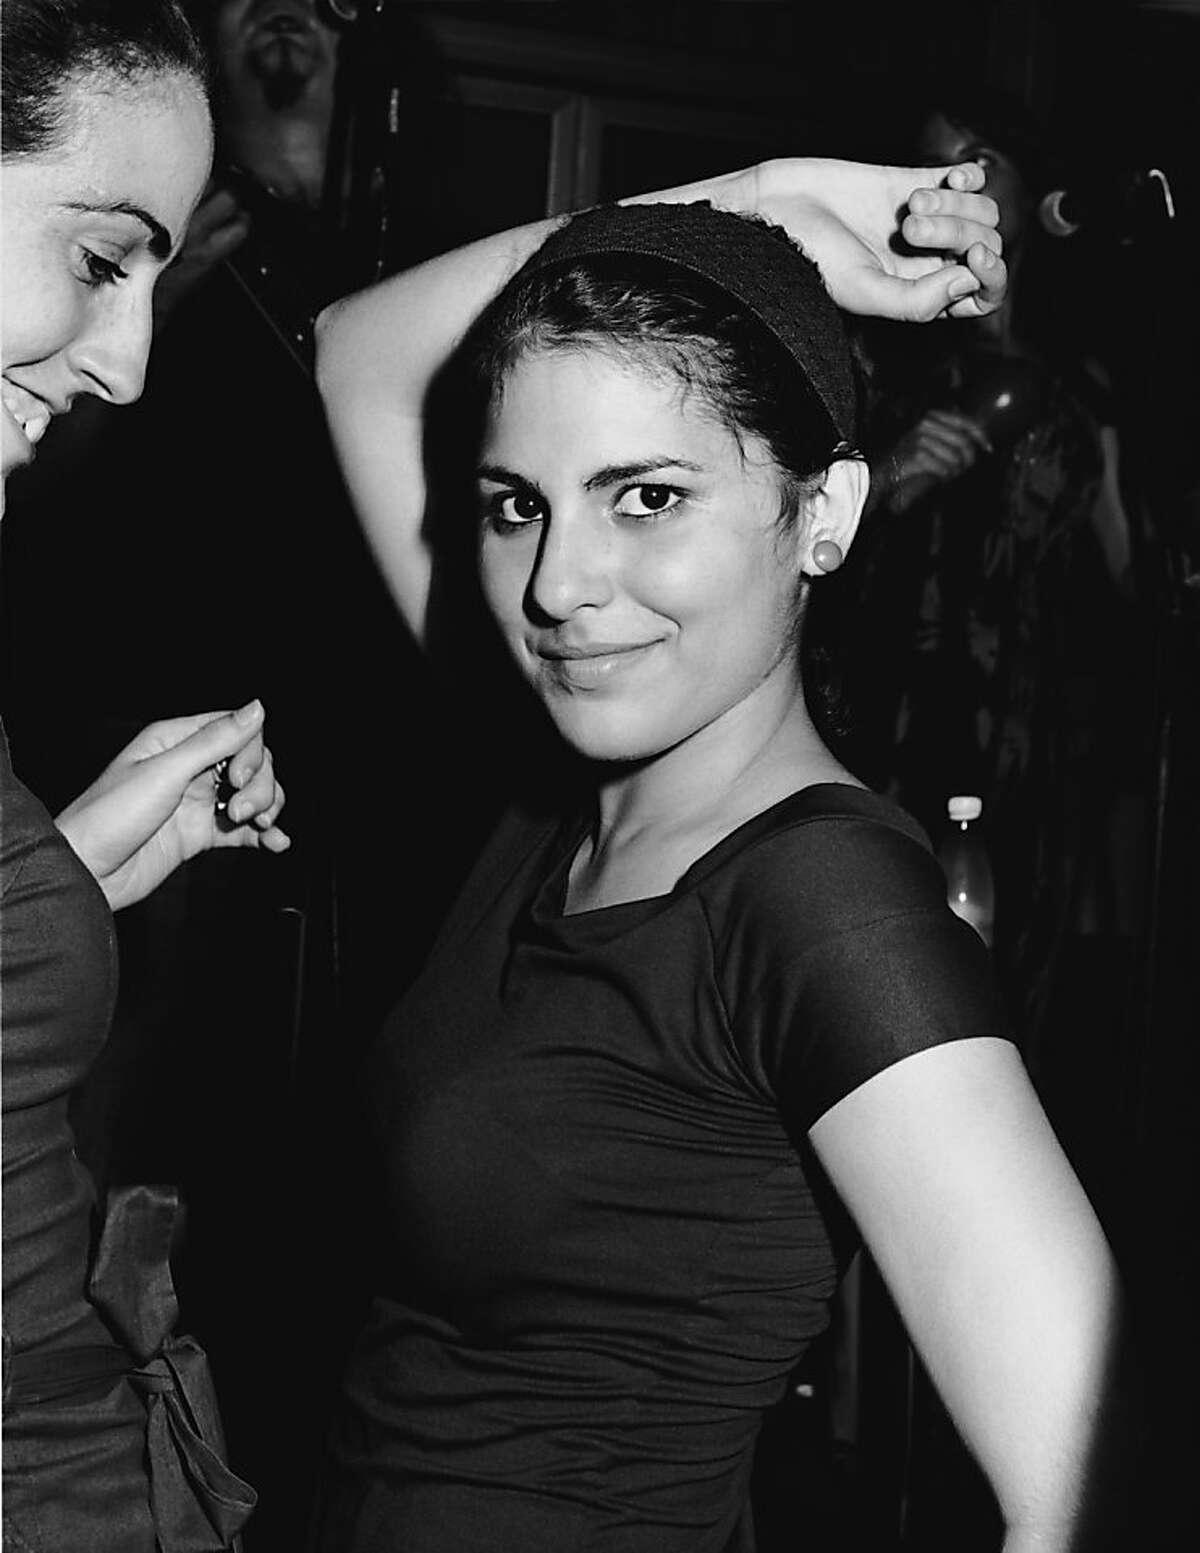 DANCING TO KELVIS MUSIC AT DON CONGREJO HABANA, 2009